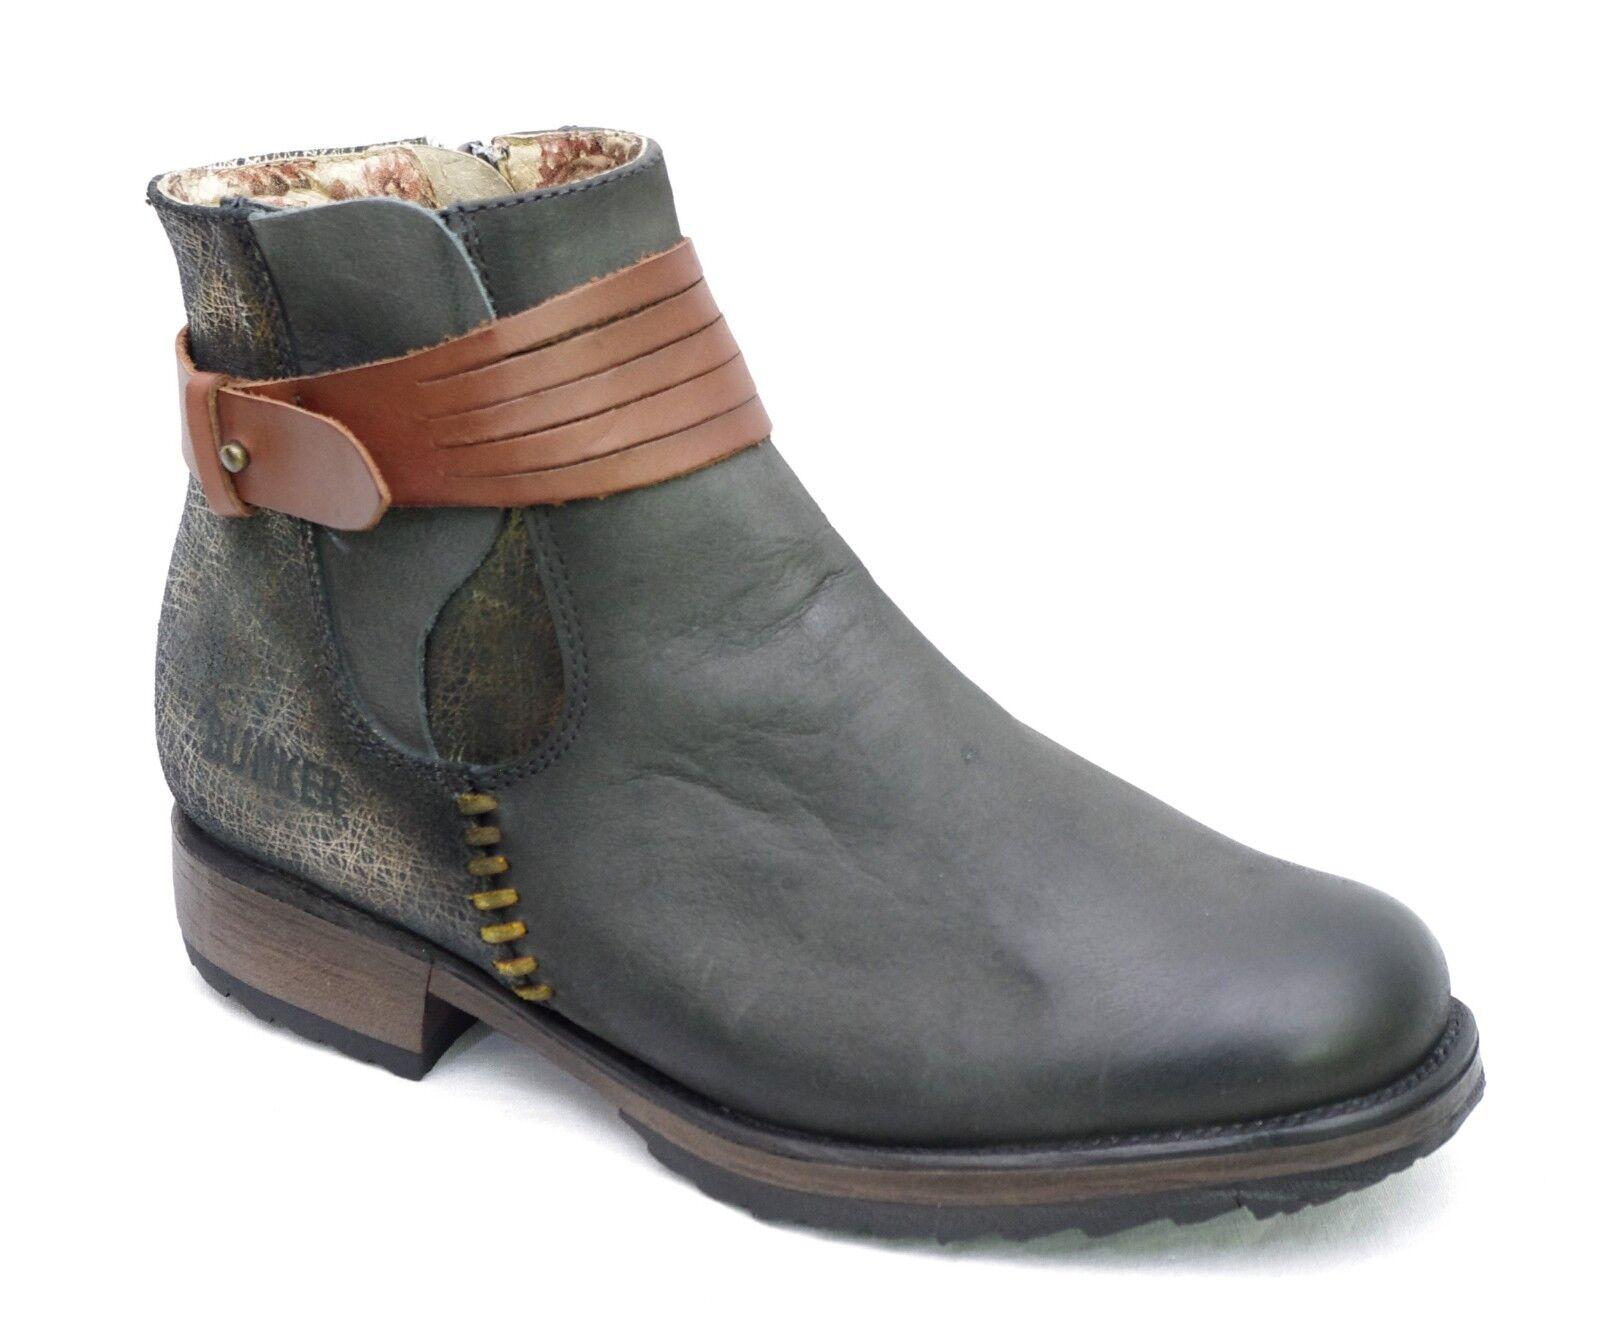 BUNKER bottines boots femme DUNG - NB1 Black coloris noir et or